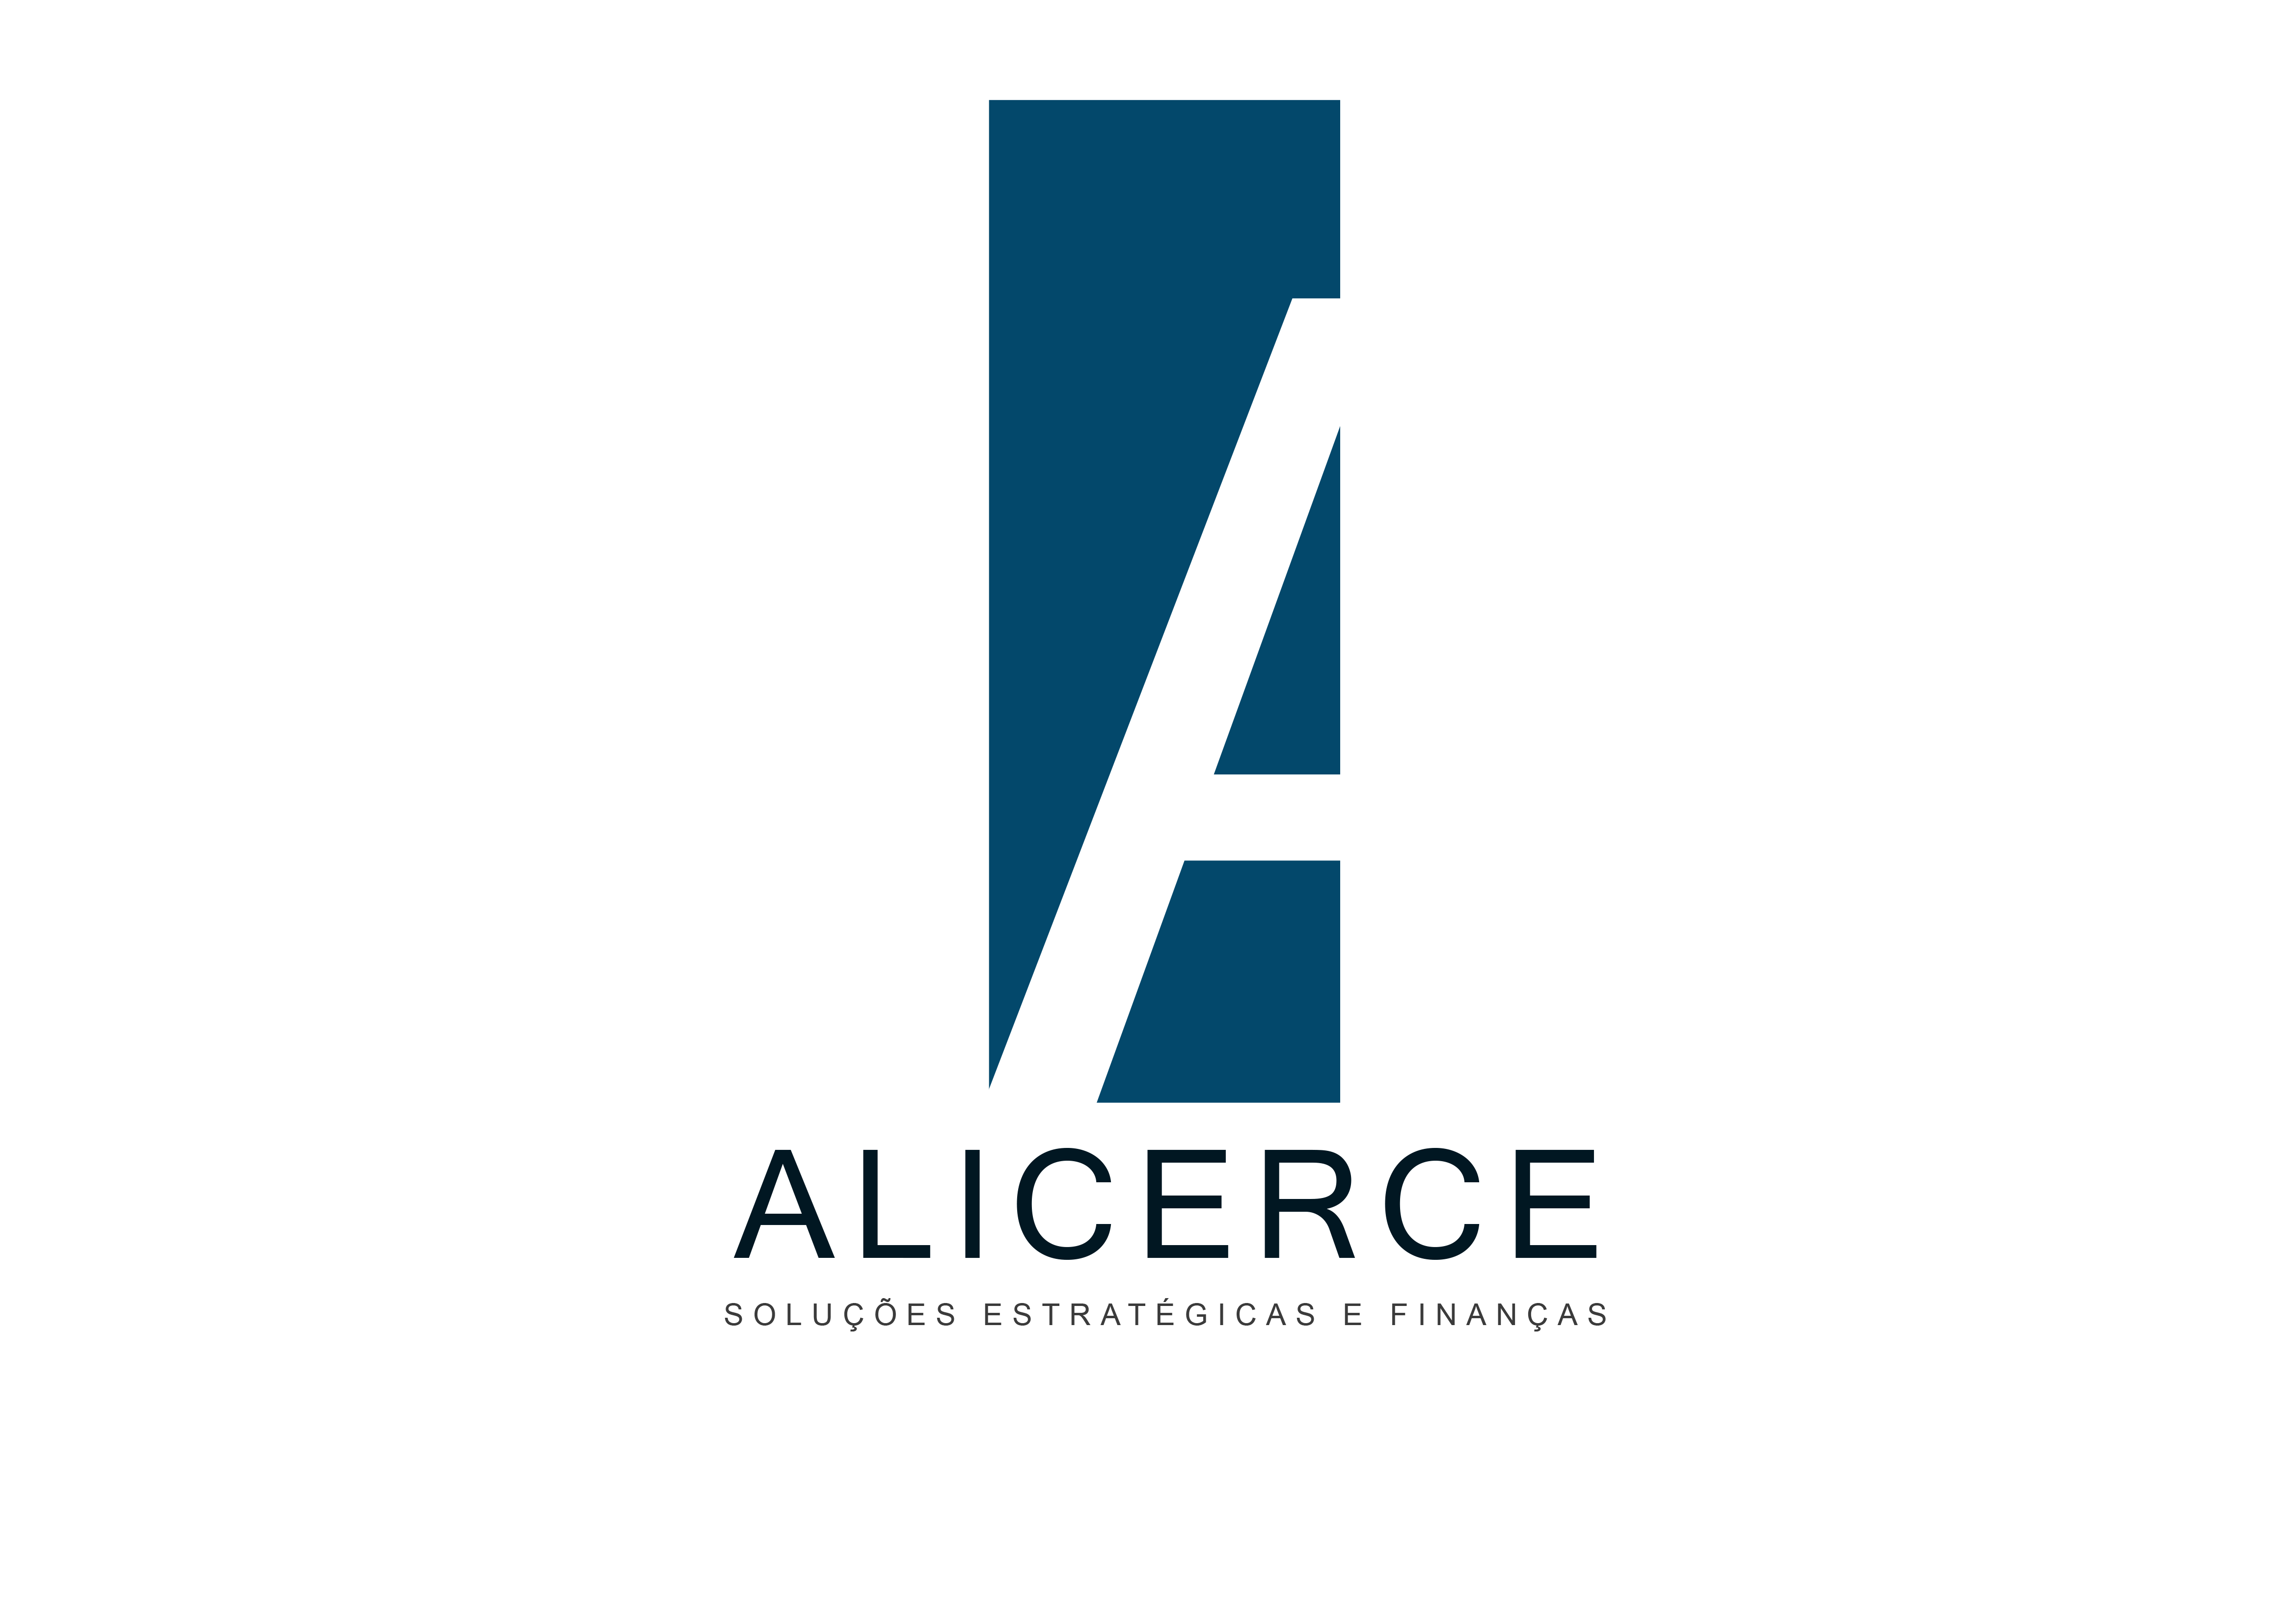 Alicerce (Transparente)